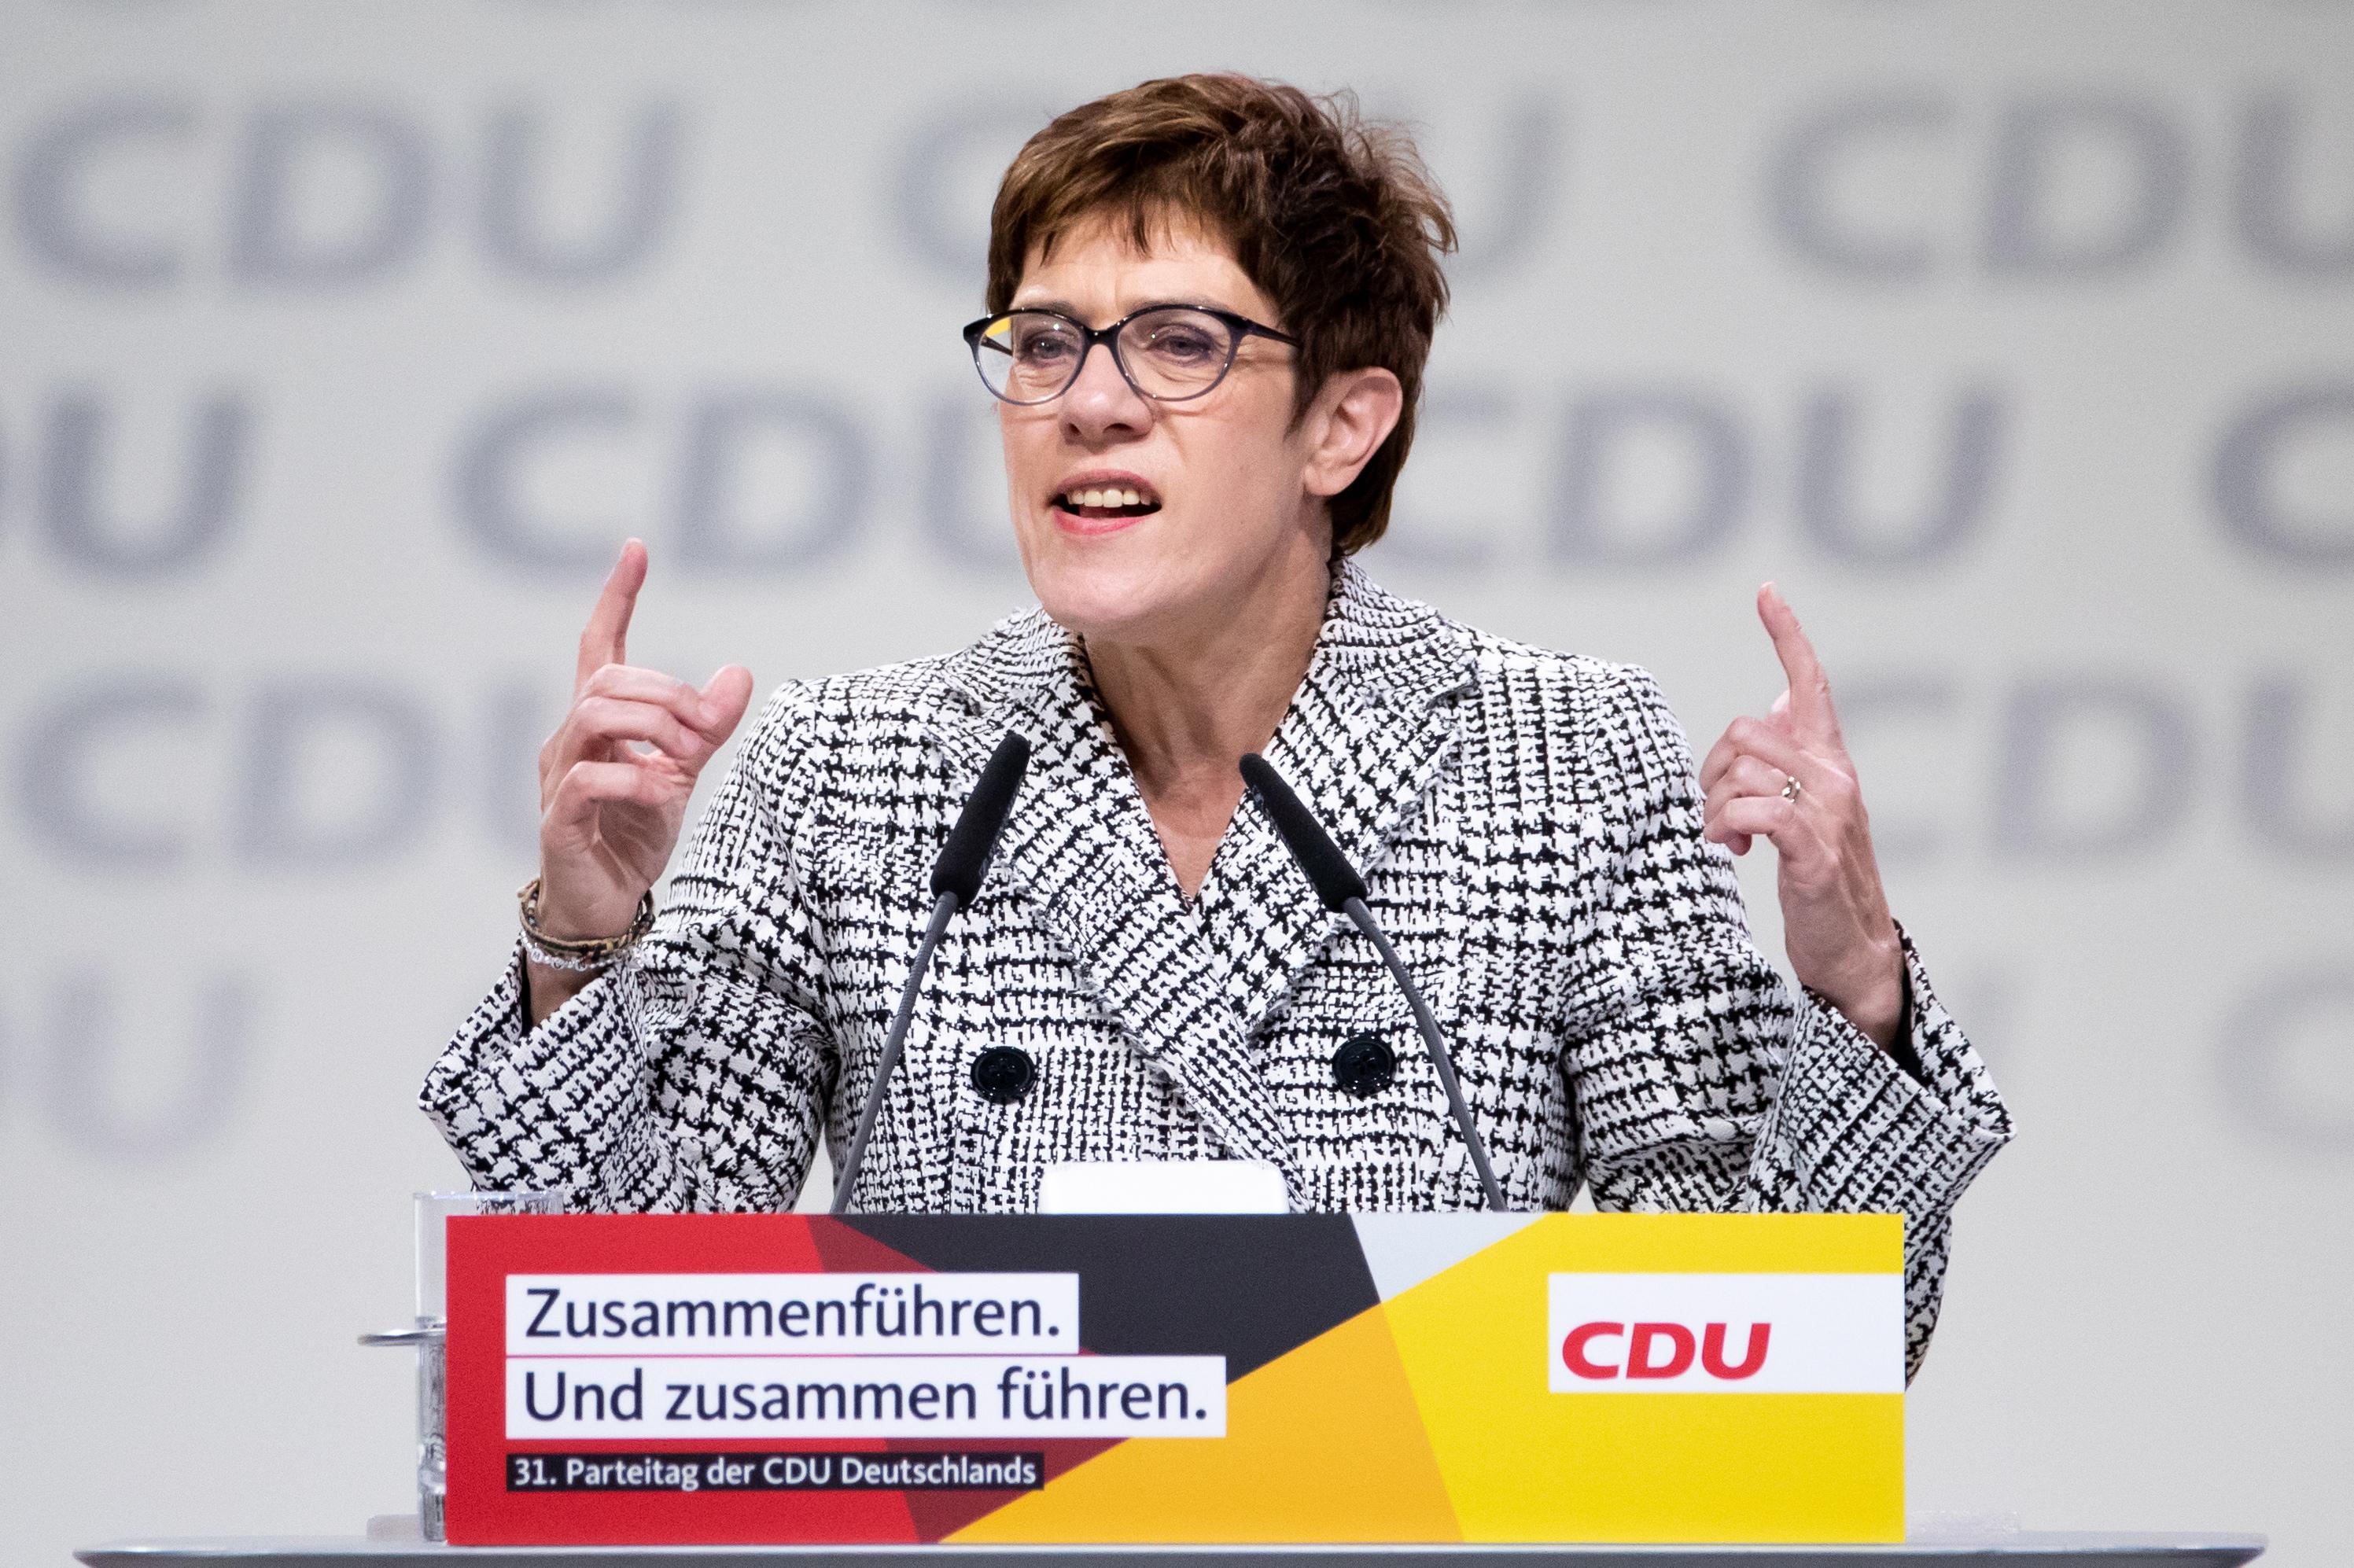 Annegret Kramp-Karrenbauer nova predsjednica CDU-a